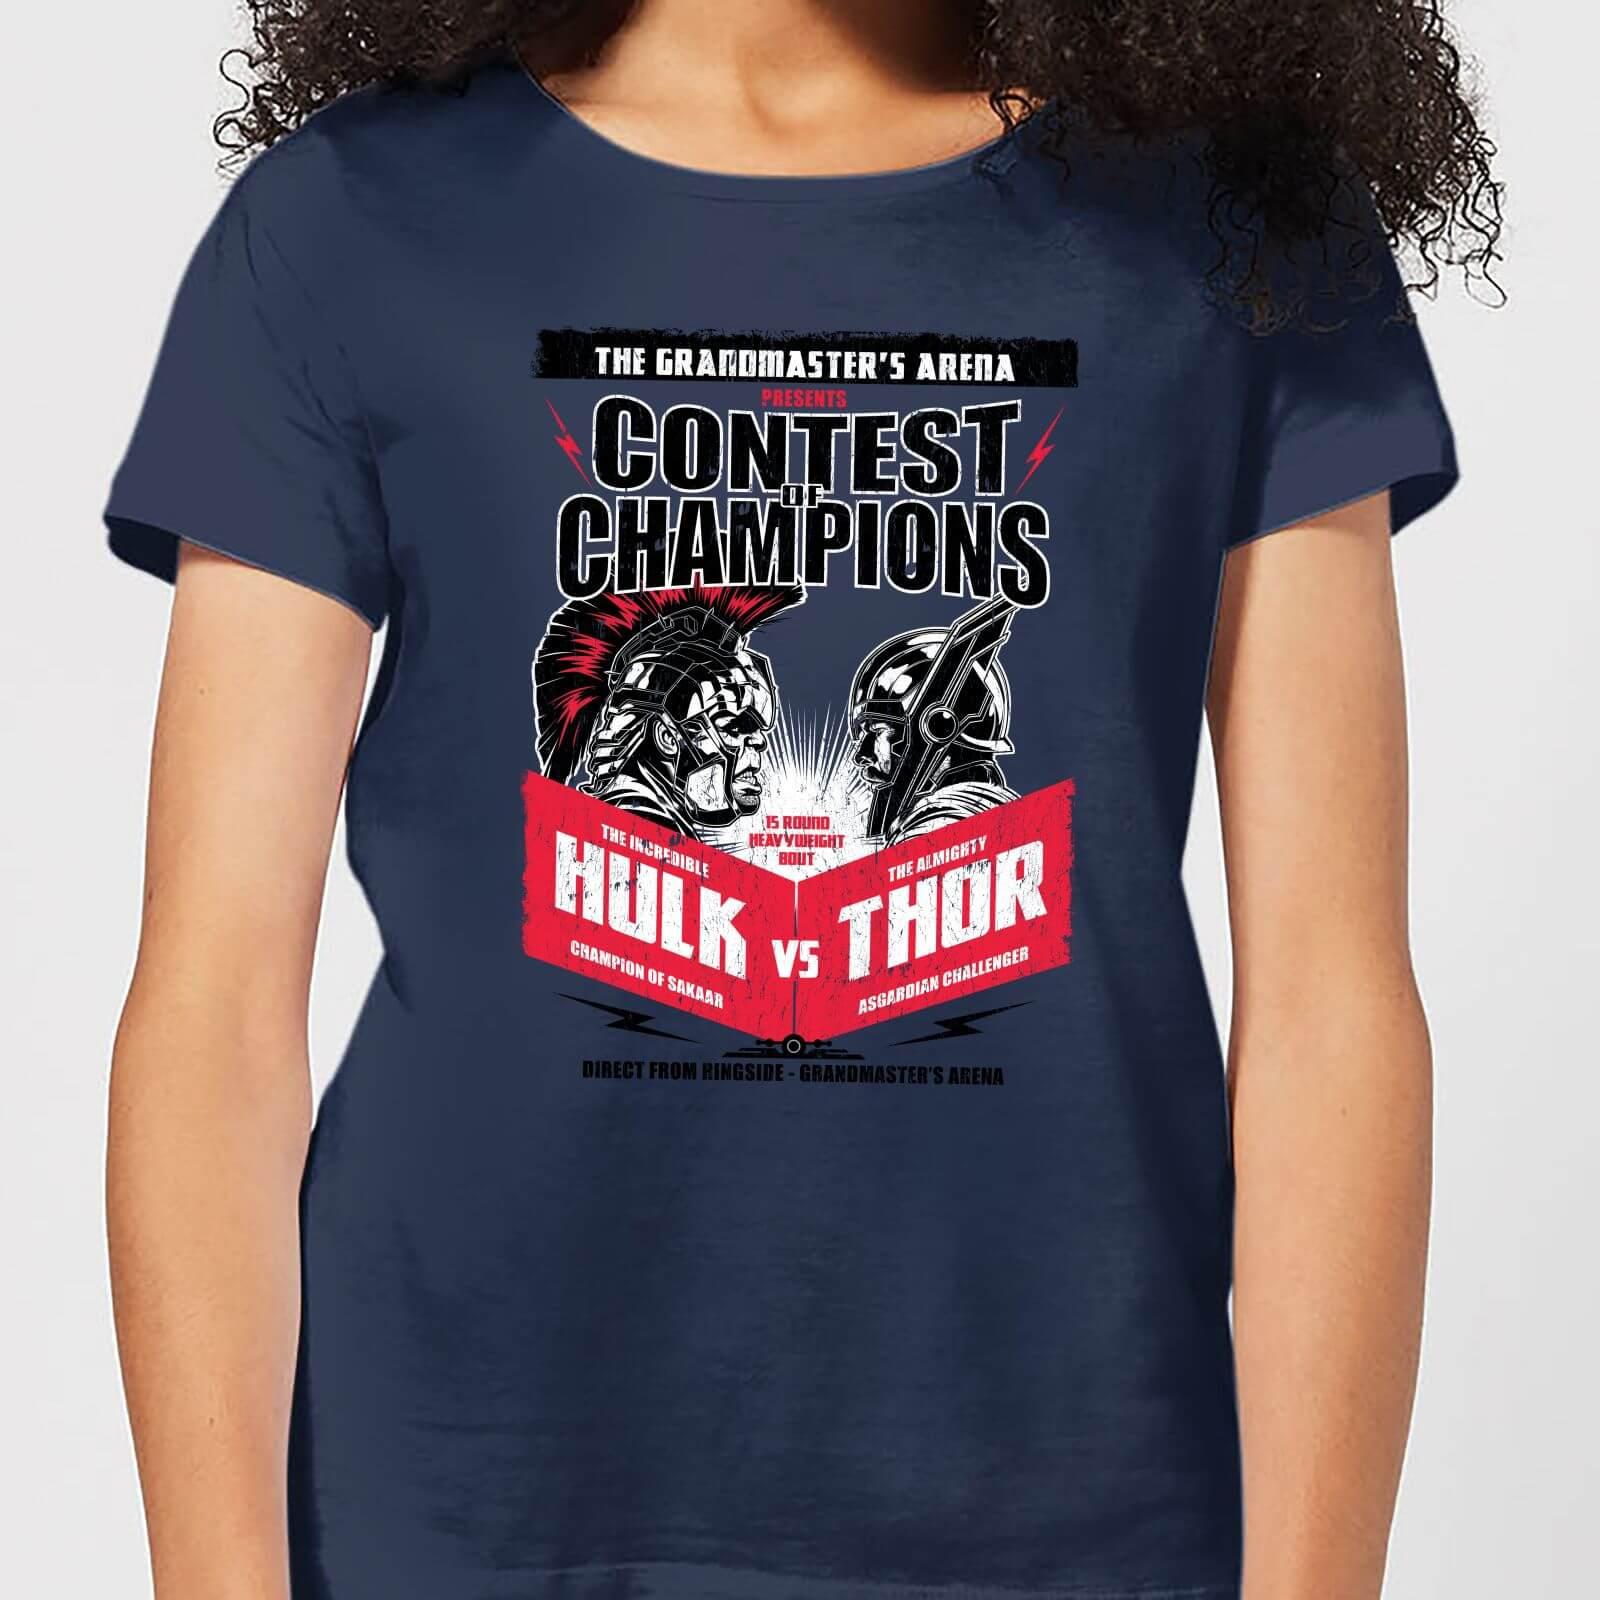 OfferteWeb.click 86-t-shirt-marvel-thor-ragnarok-champions-poster-navy-donna